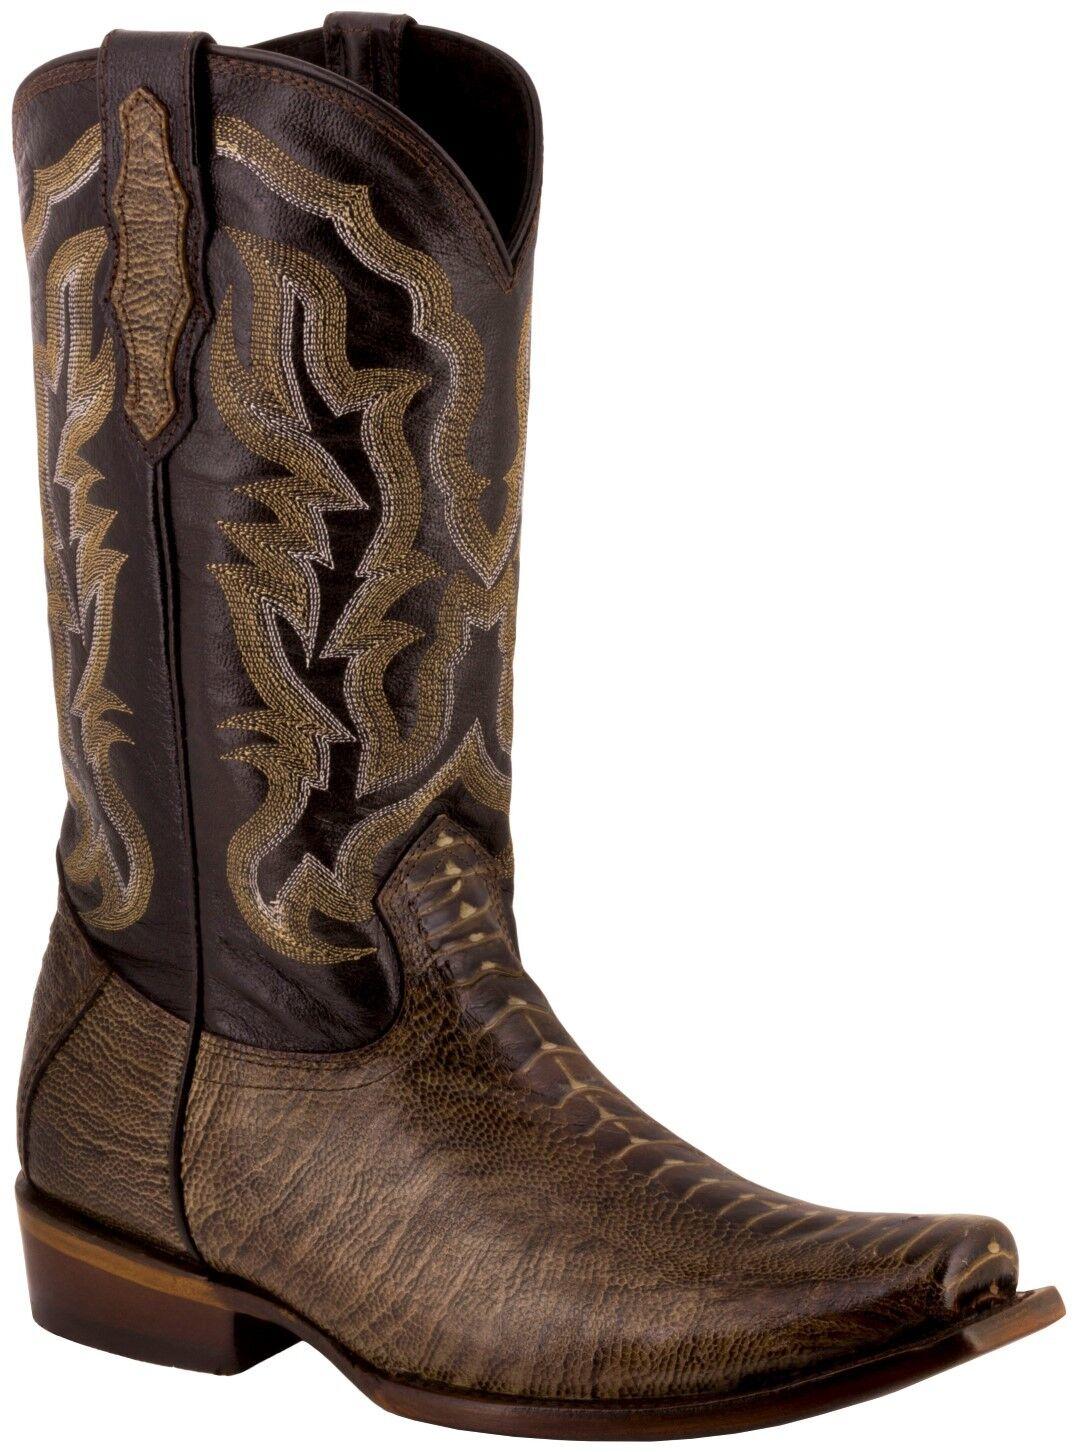 Uomo Genuine Pelle Brown Print Ostrich Leg Print Brown Rodeo Cowboy Stivali Square